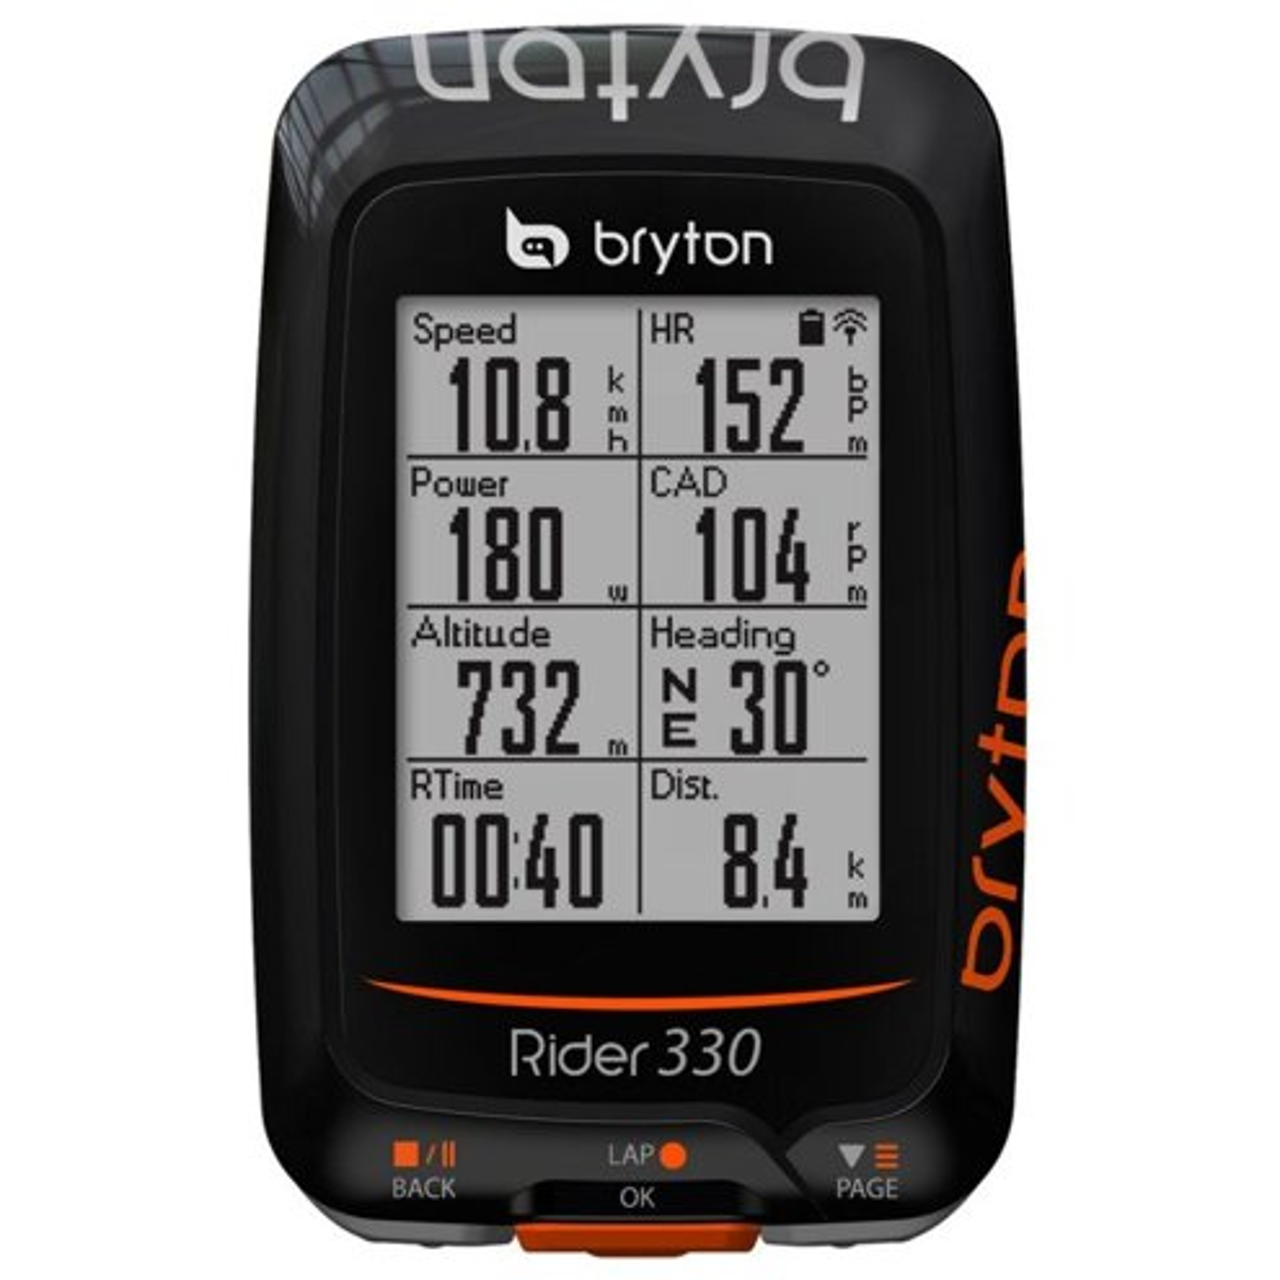 GPS BRYTON 330E 72 FUNÇÕES C/ ROTA WI-FI/BLUETOOTH 4.0/ ANT+